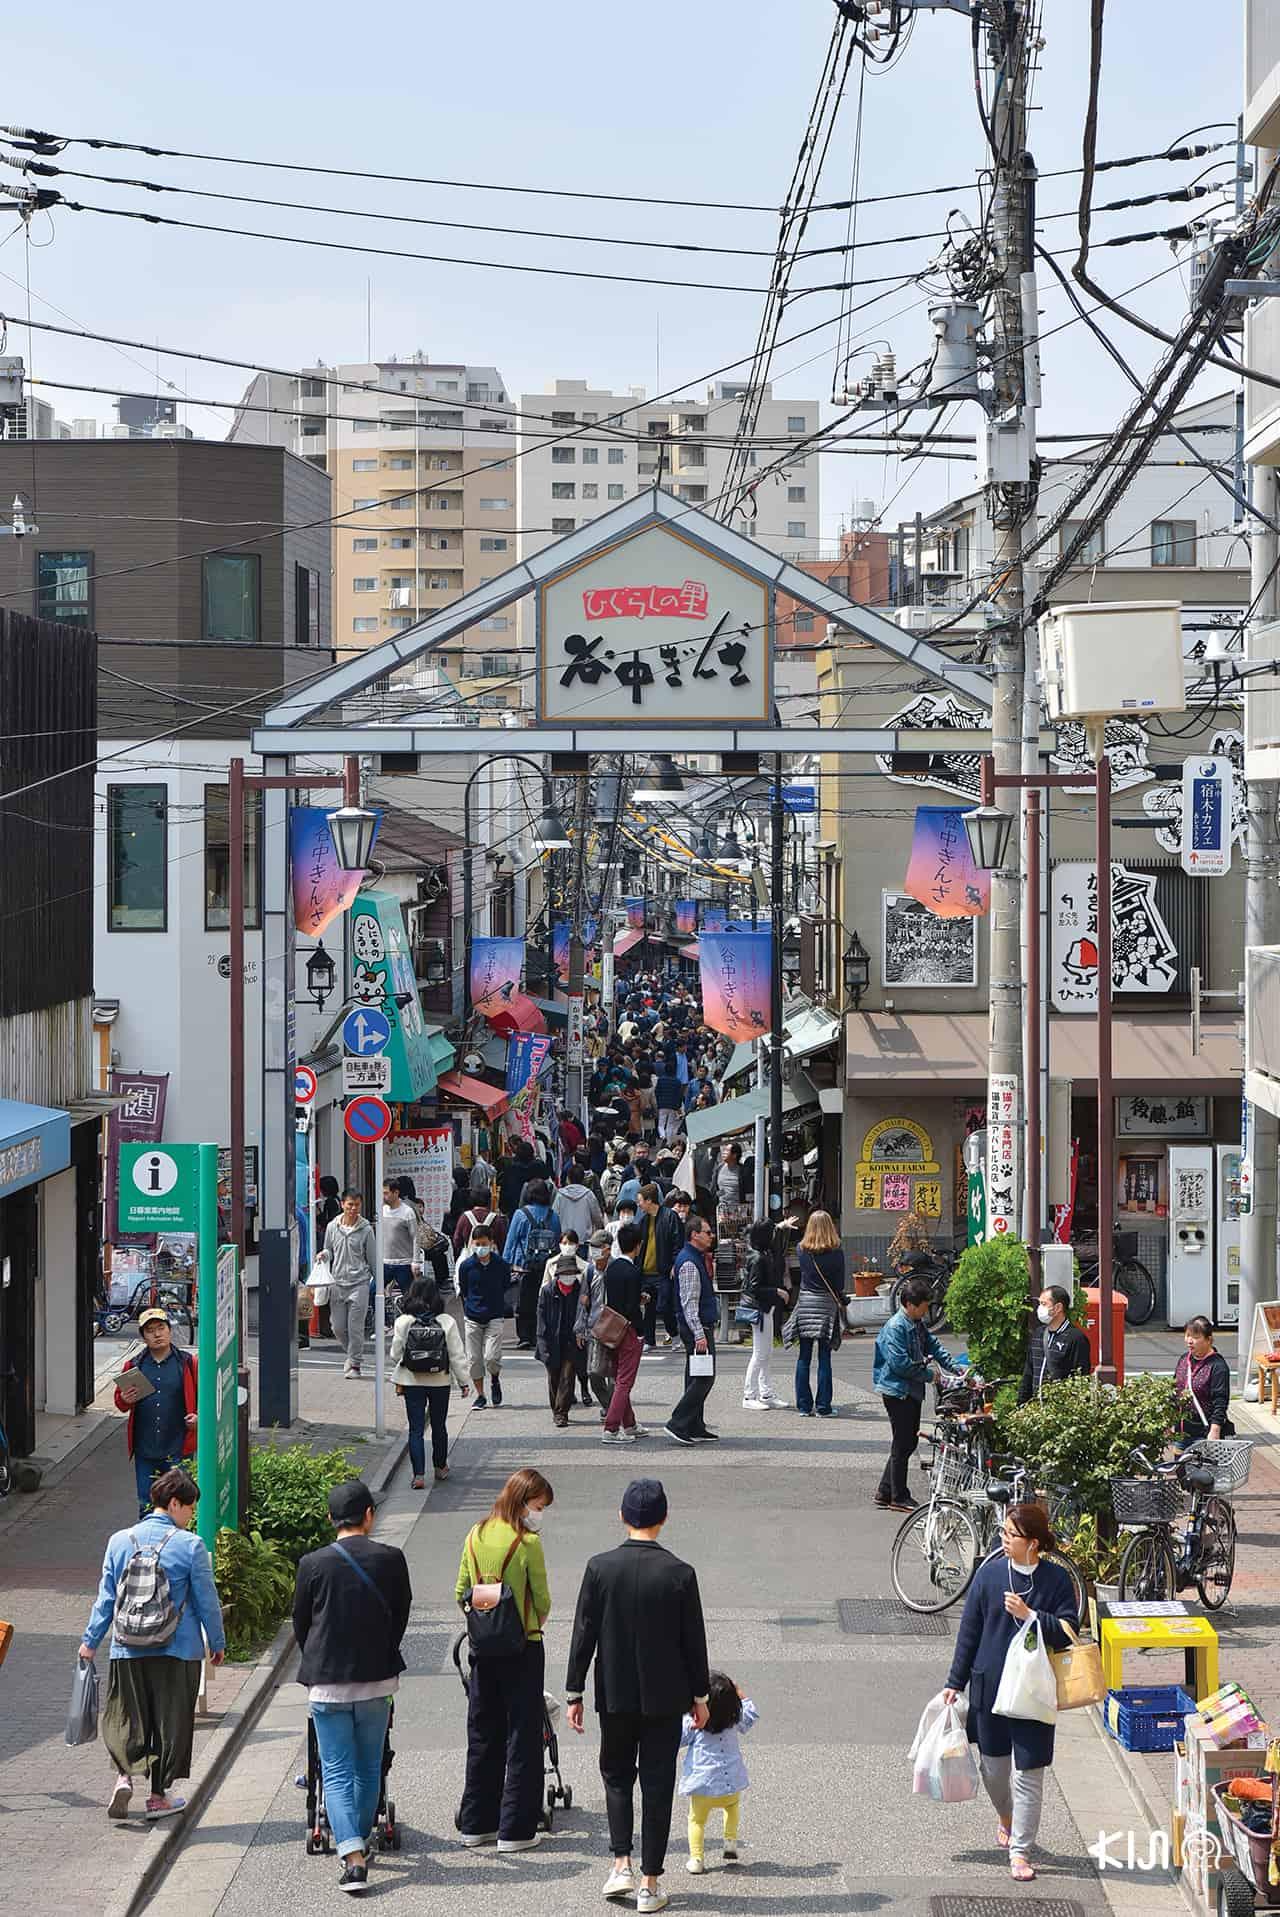 Yanaka Ginza หนึ่งในสถานที่ท่องเที่ยวยอดนิยมของ Yanesen